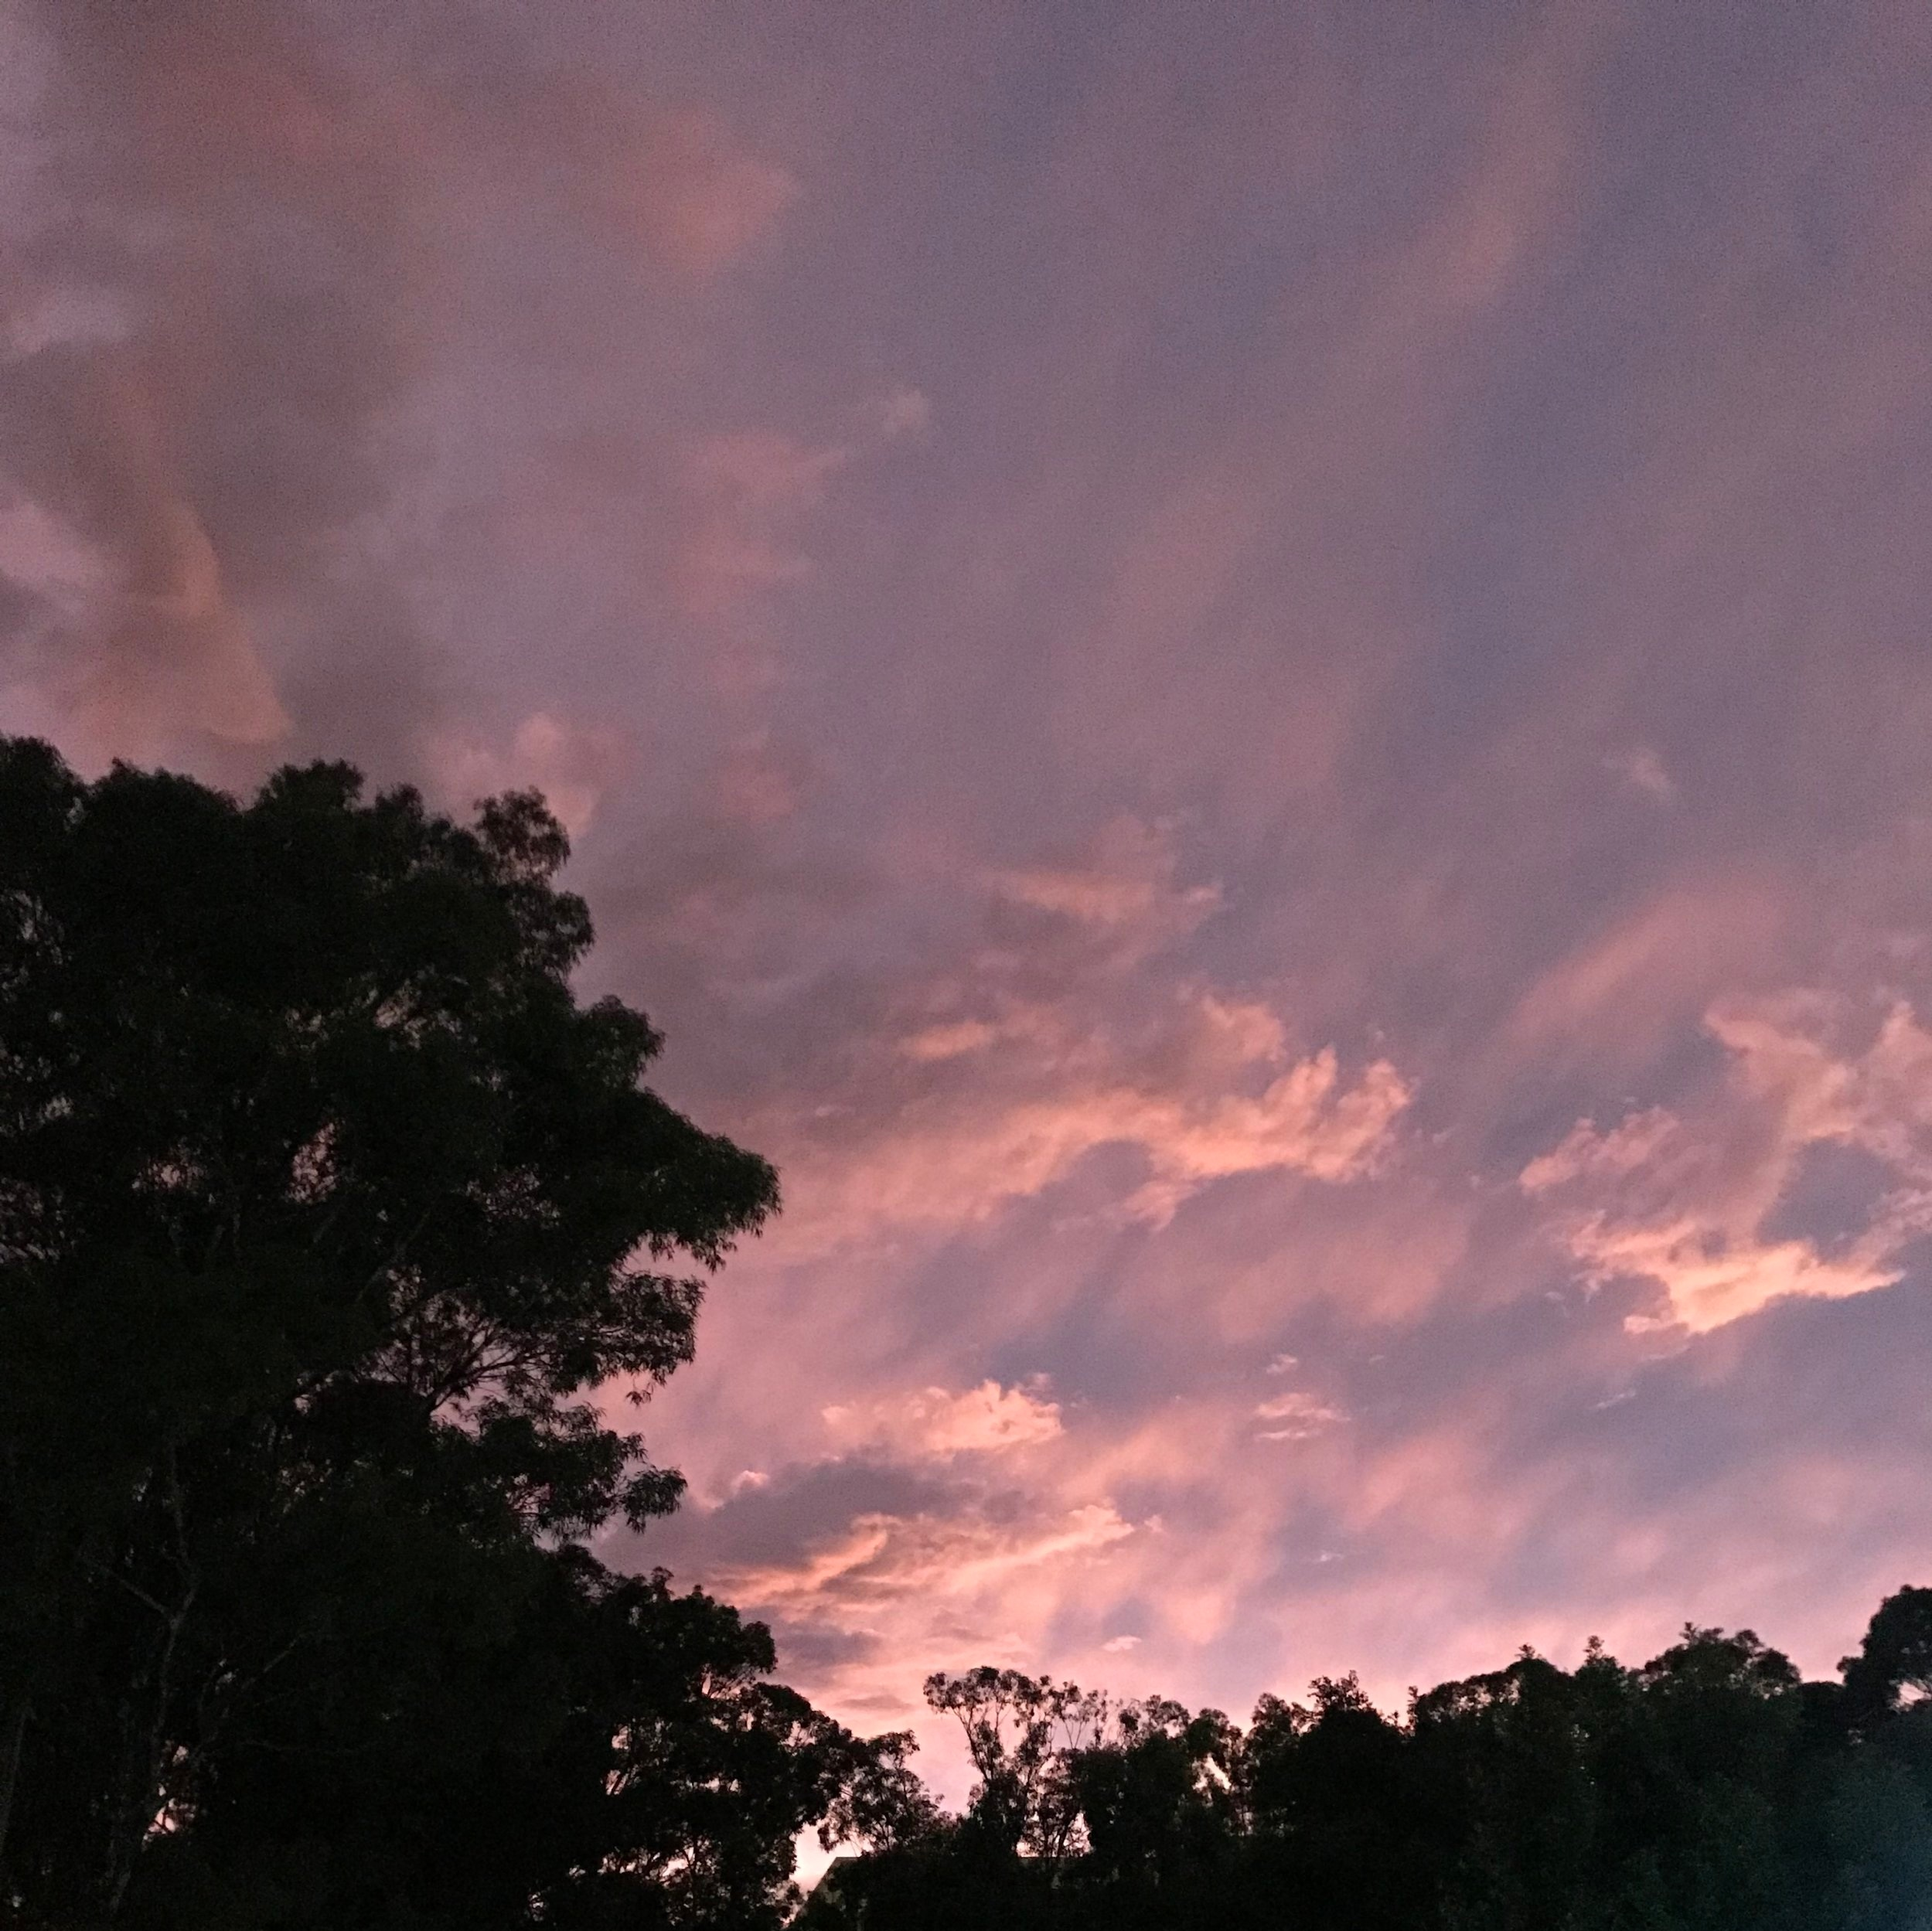 sunrisestorm